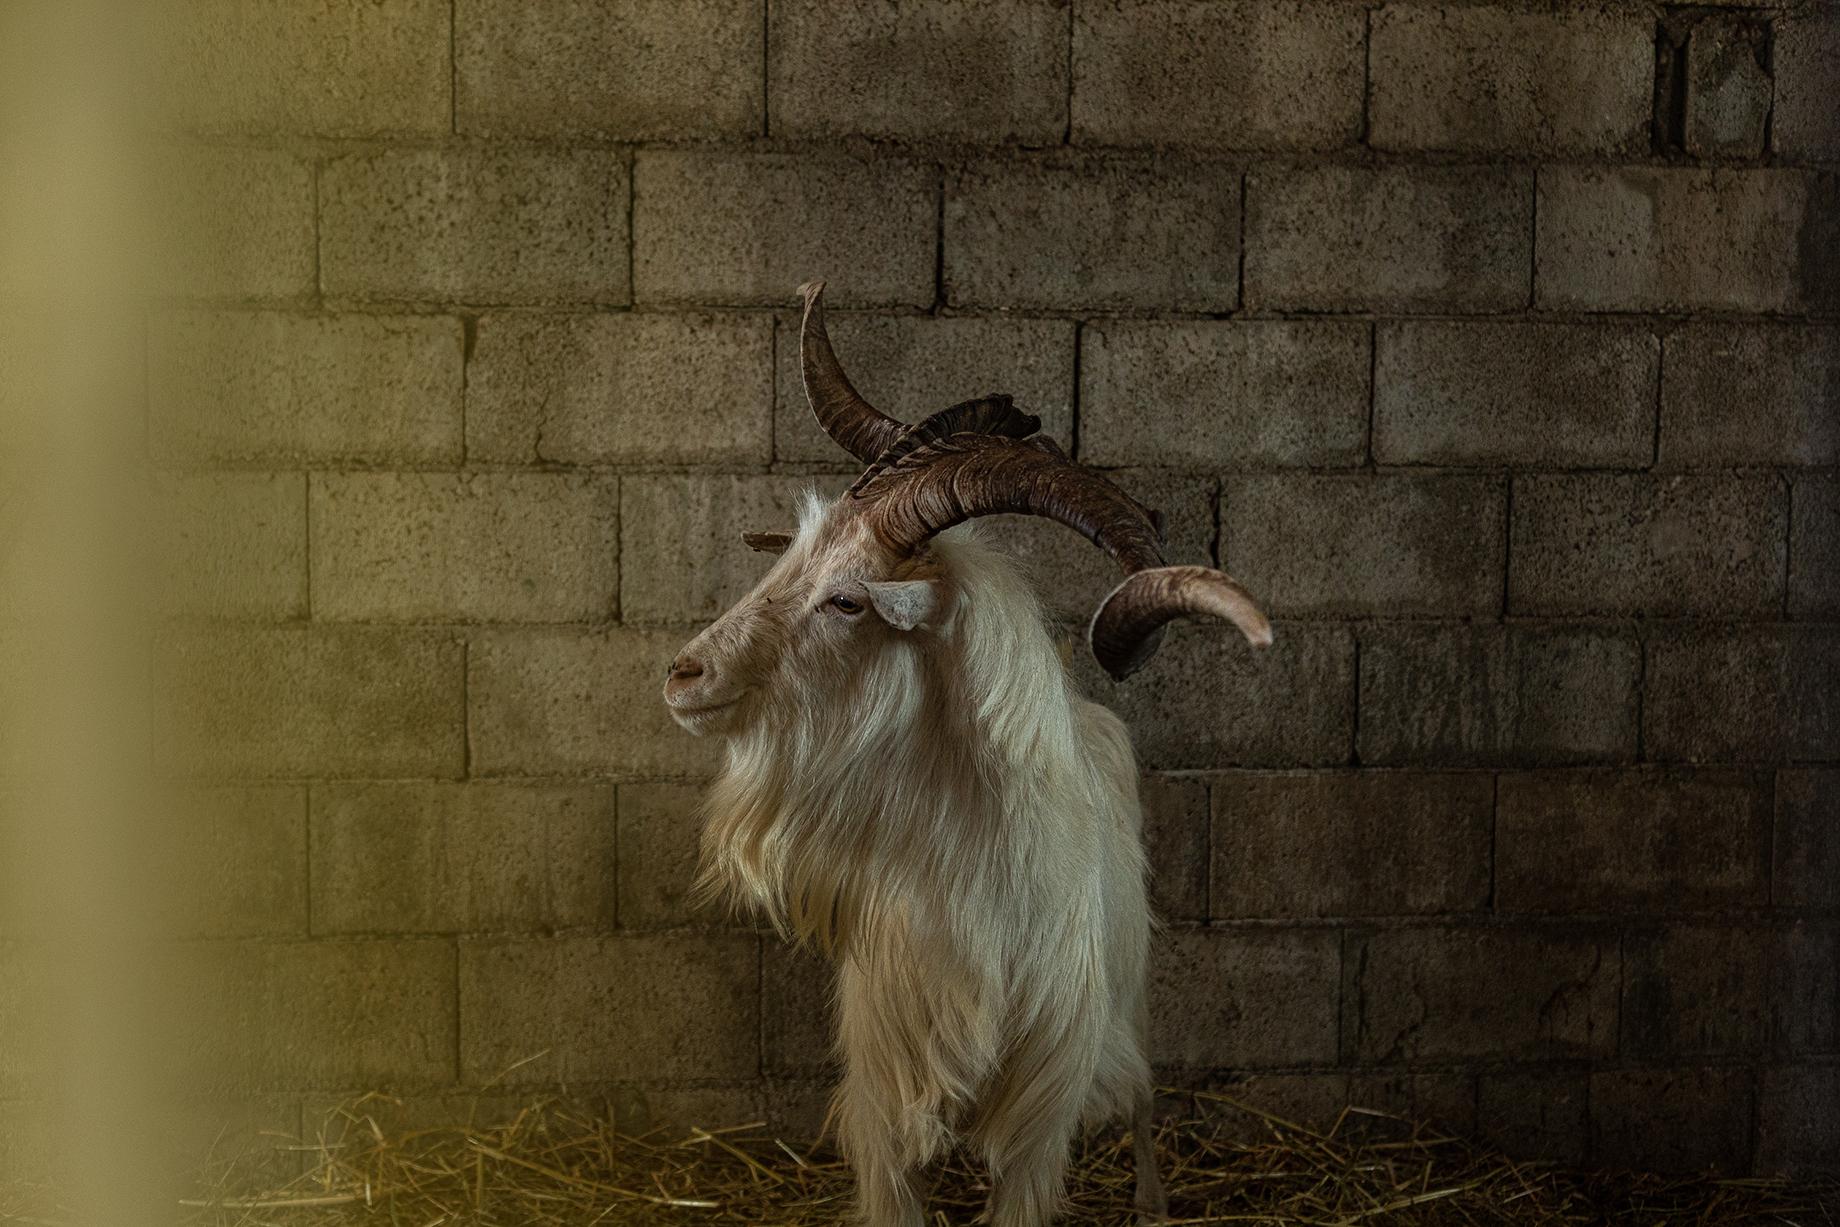 A male goat shot by Alberto Bernasconi for Enjoy magazine